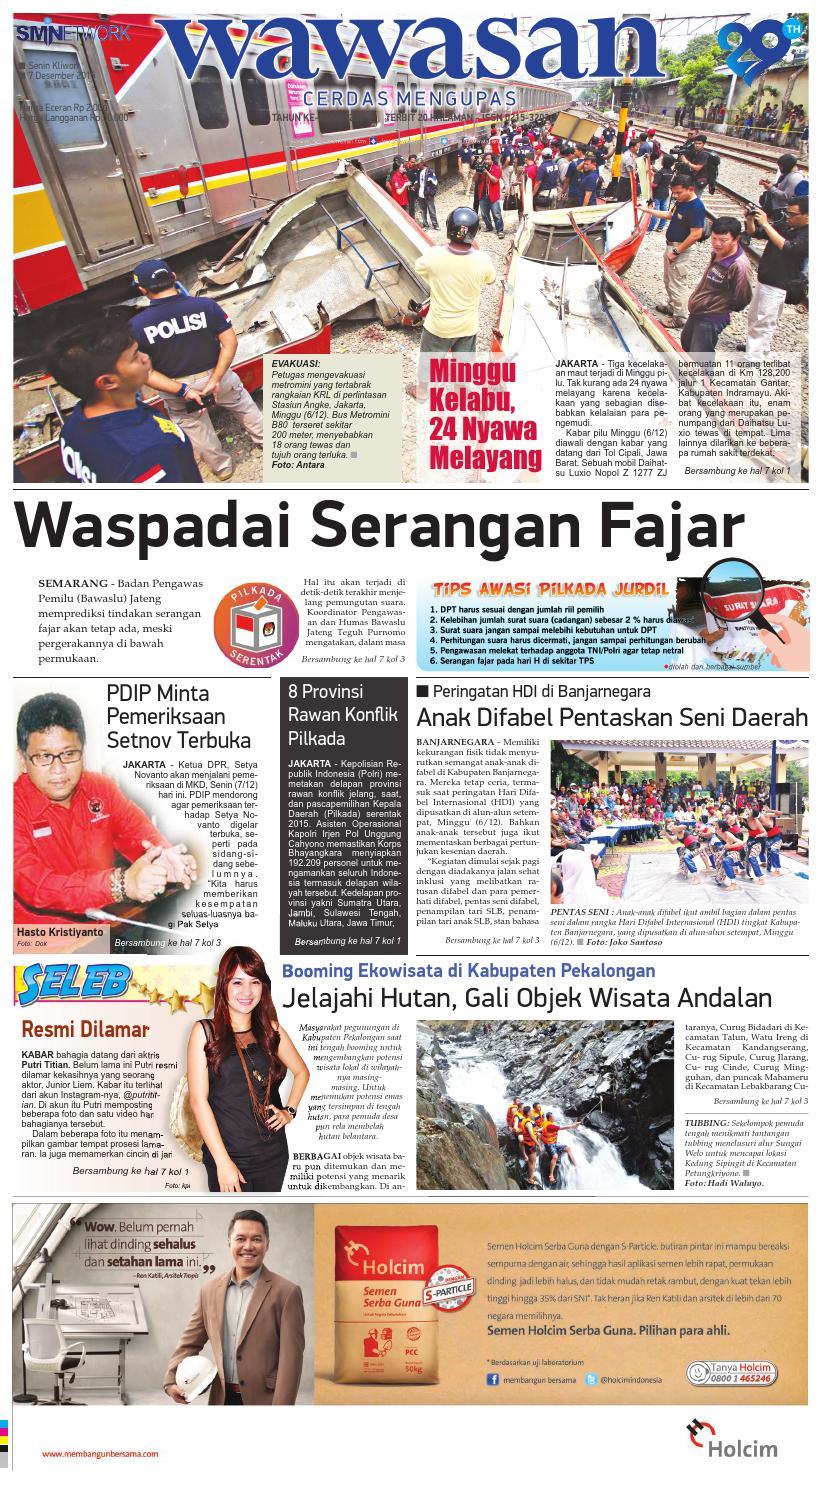 WAWASAN 07 Desember 2015 by KORAN PAGI WAWASAN - issuu af67d45b51